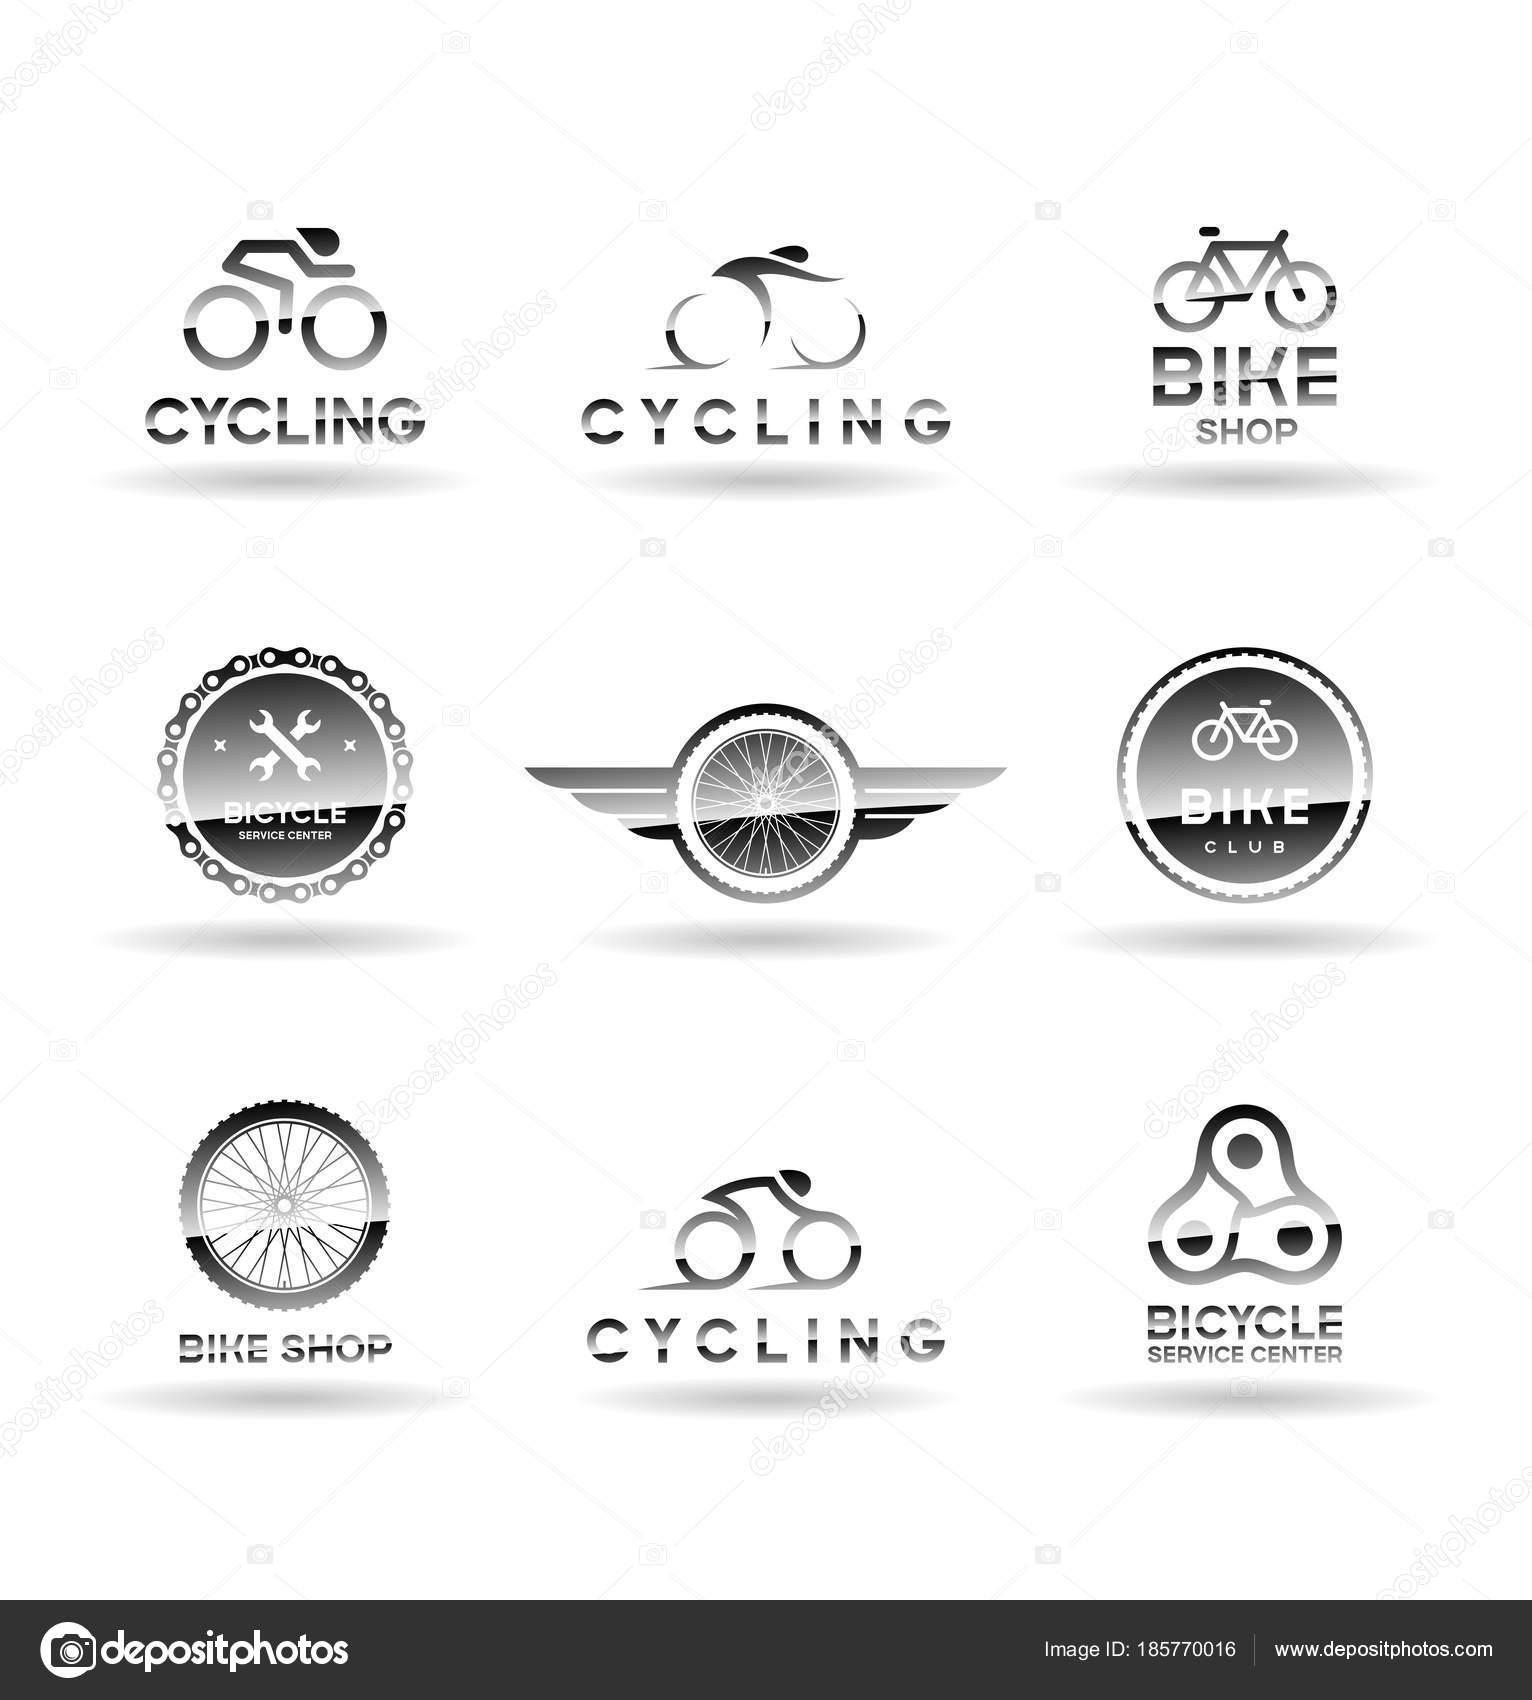 ae48ea6d70 Jízdní Kola Cyklistické Logo Nápady — Stock Vektor © pnedesign ...